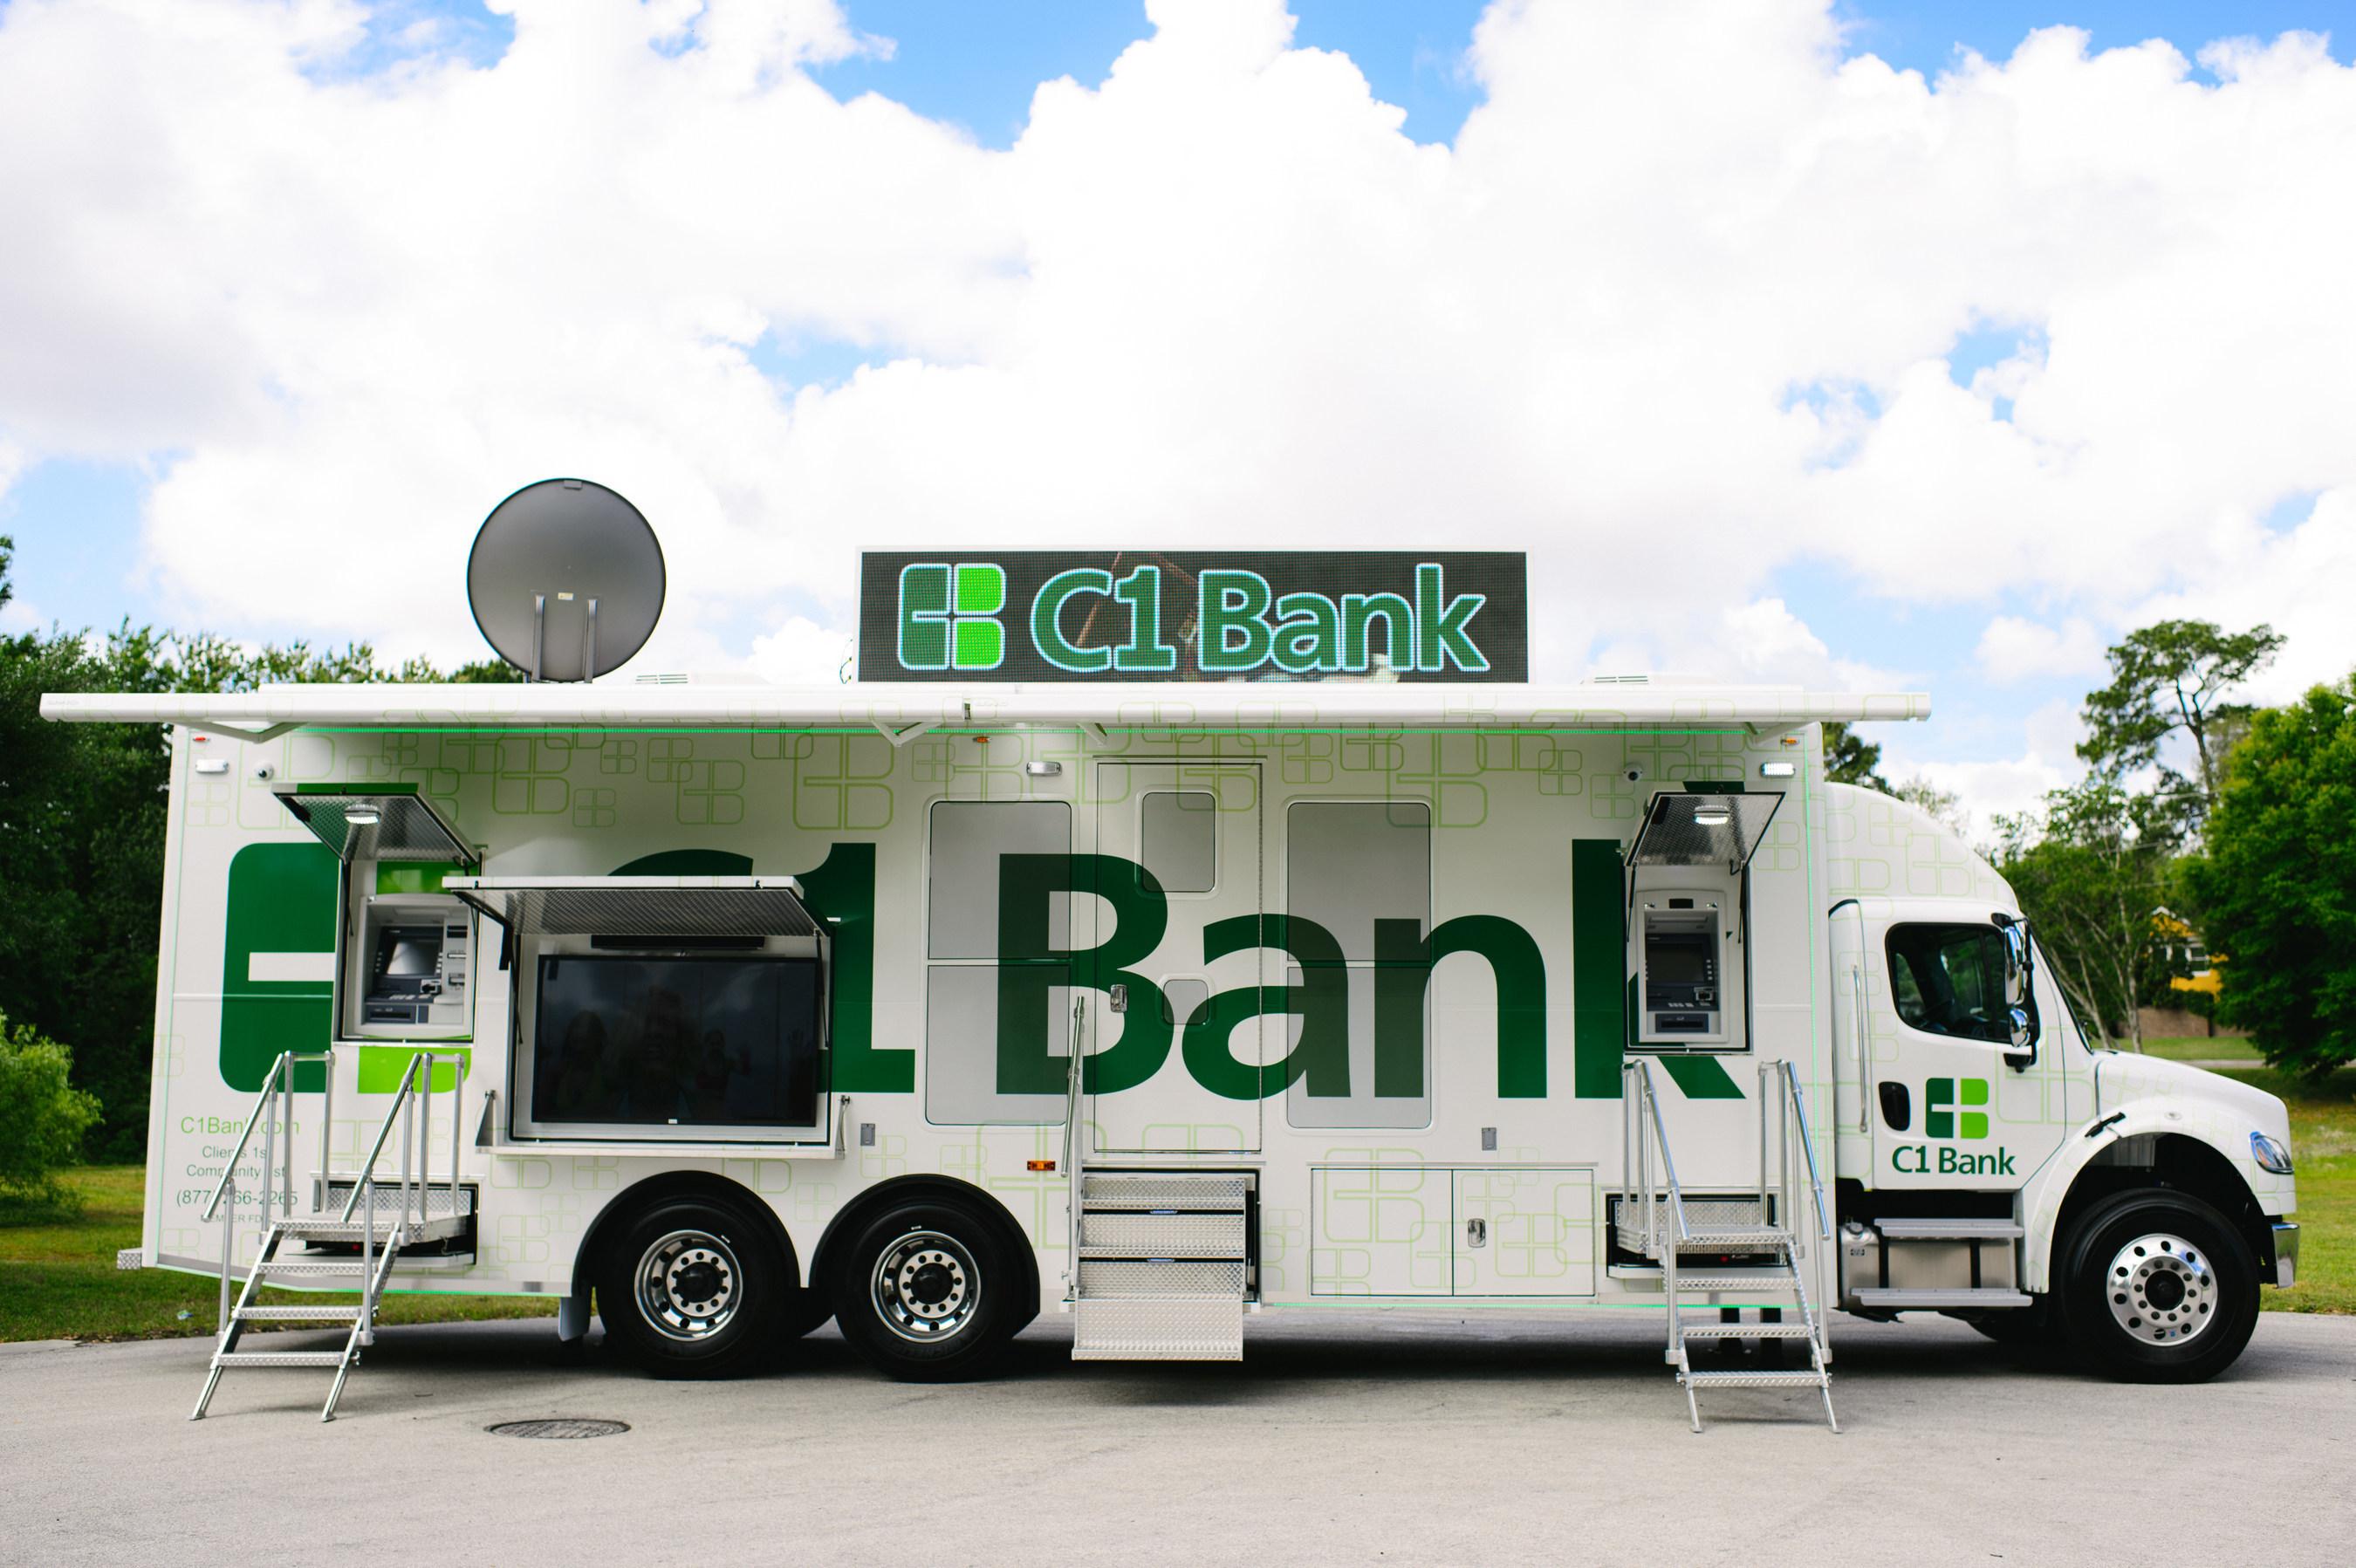 C1 Bankmobile exterior